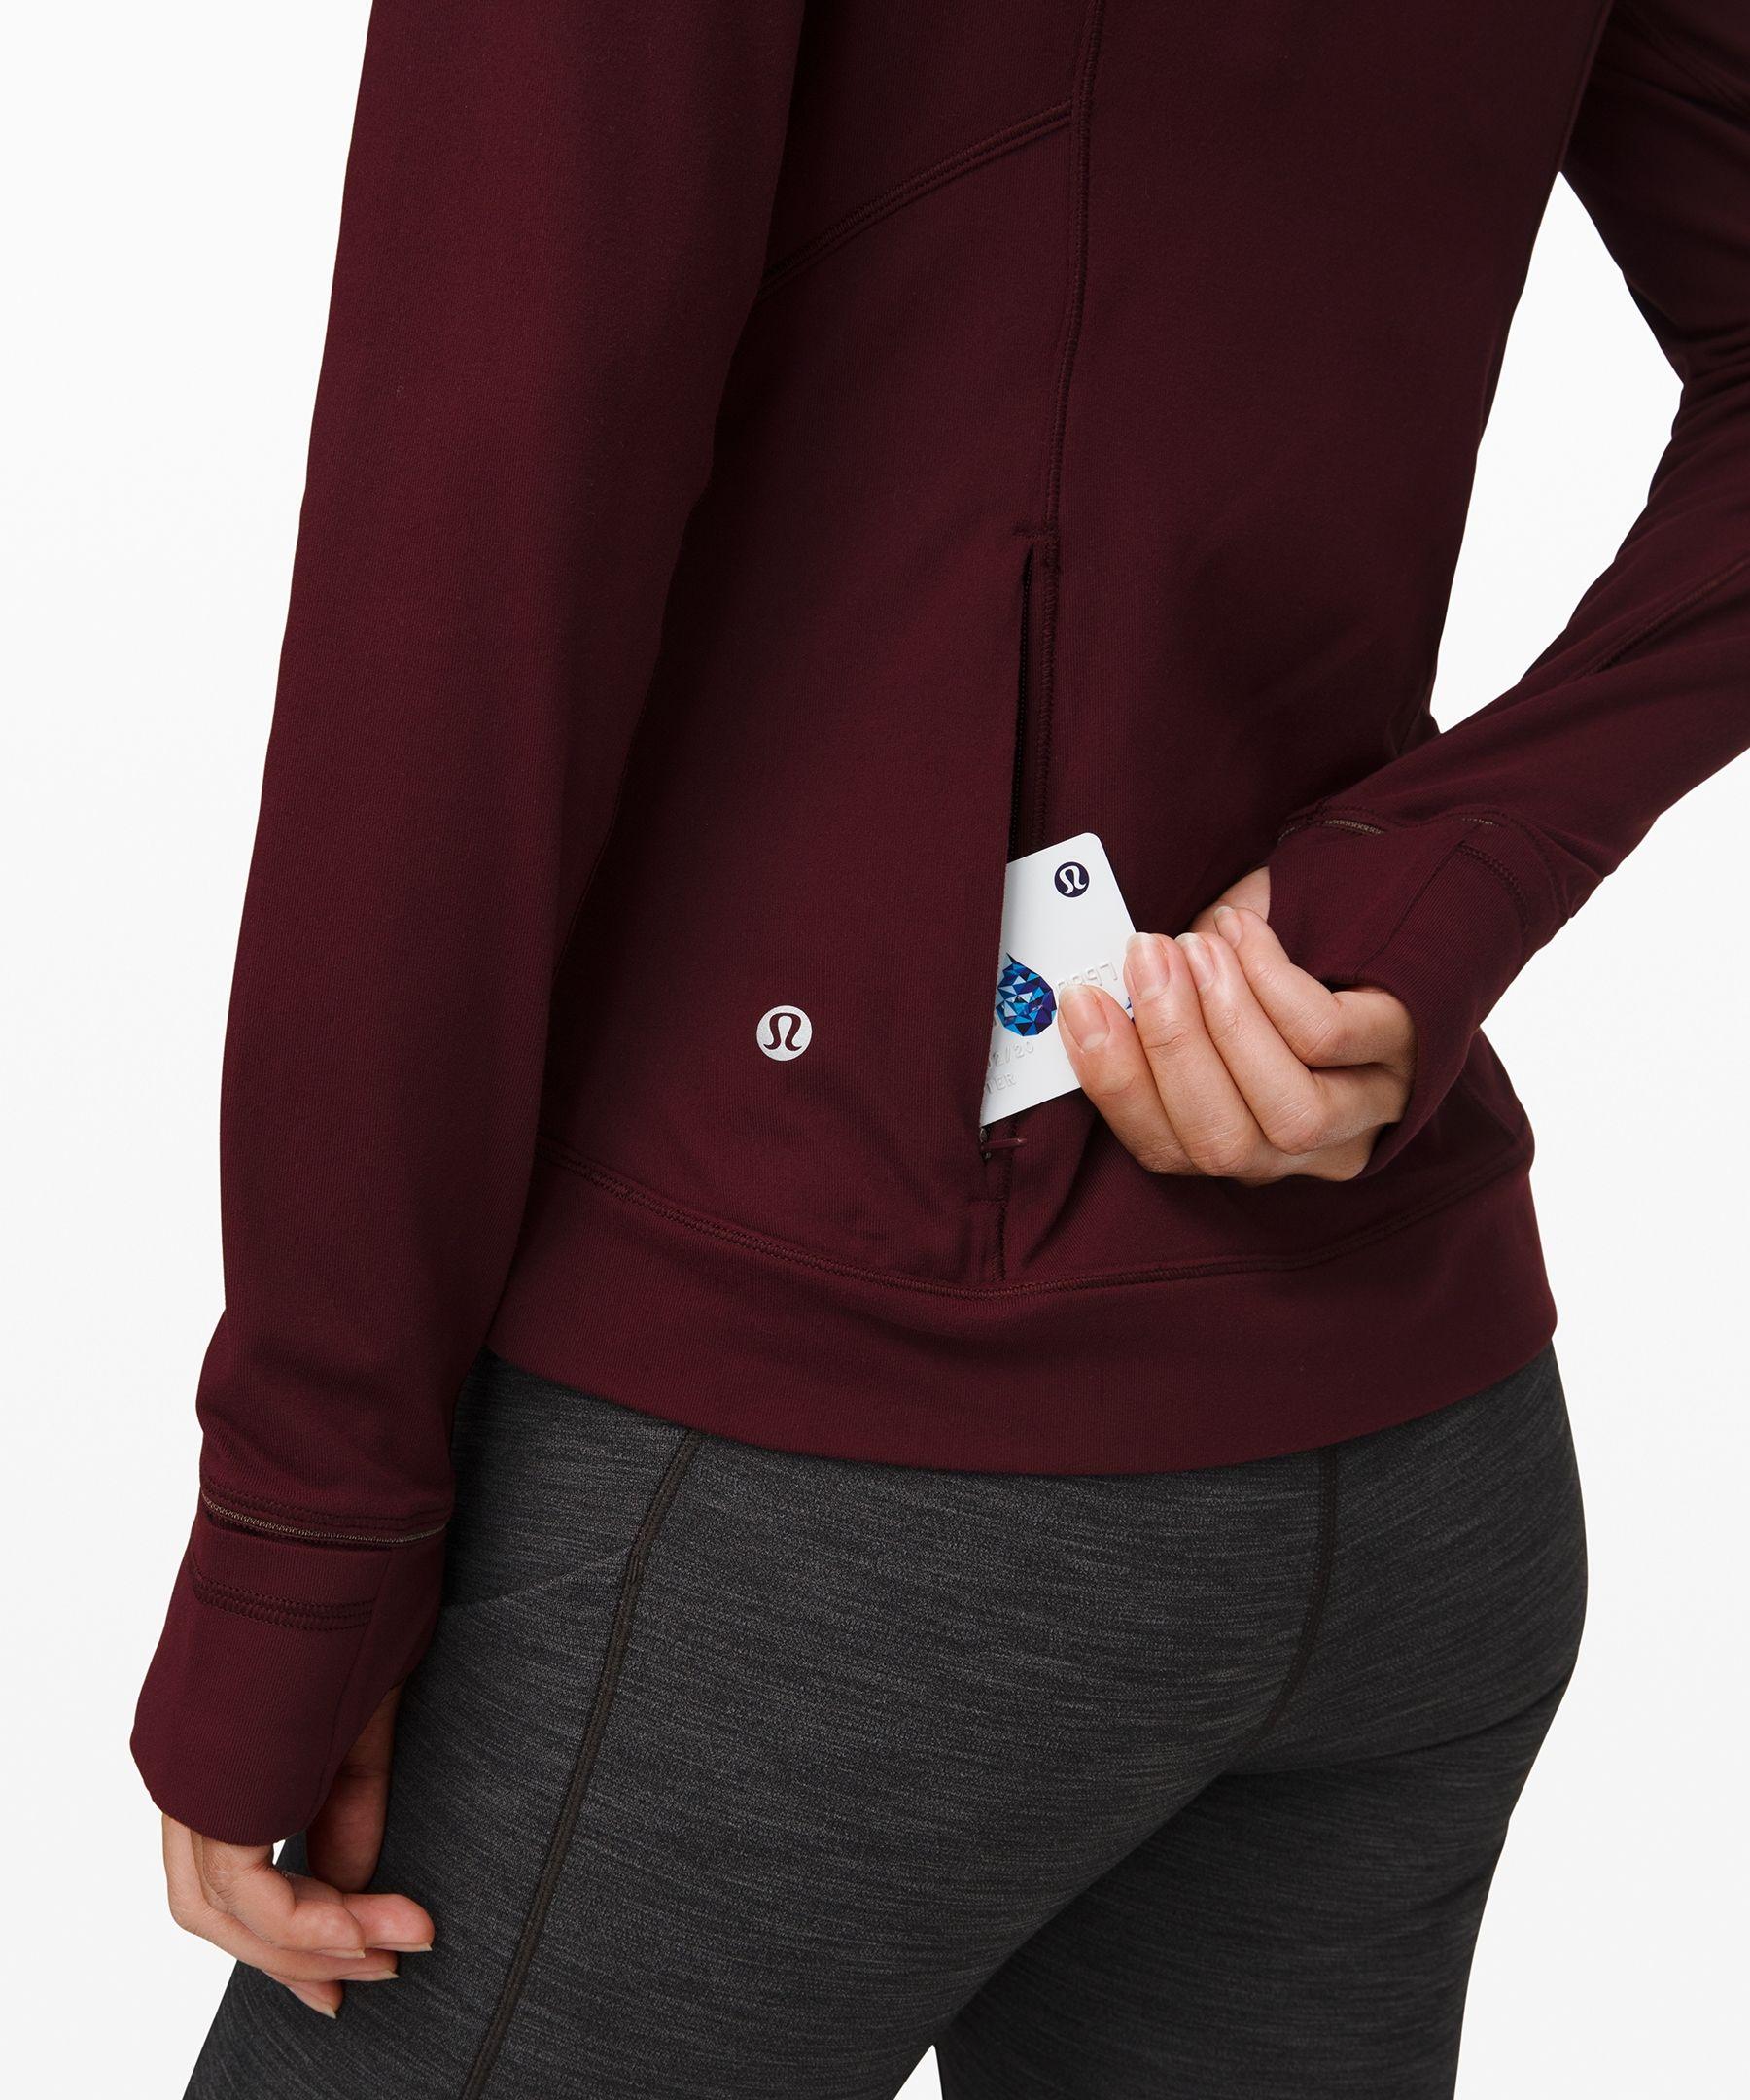 Outrun the Elements 1/2 Zip | Women's Hoodies + Sweatshirts | lululemon athletica 3